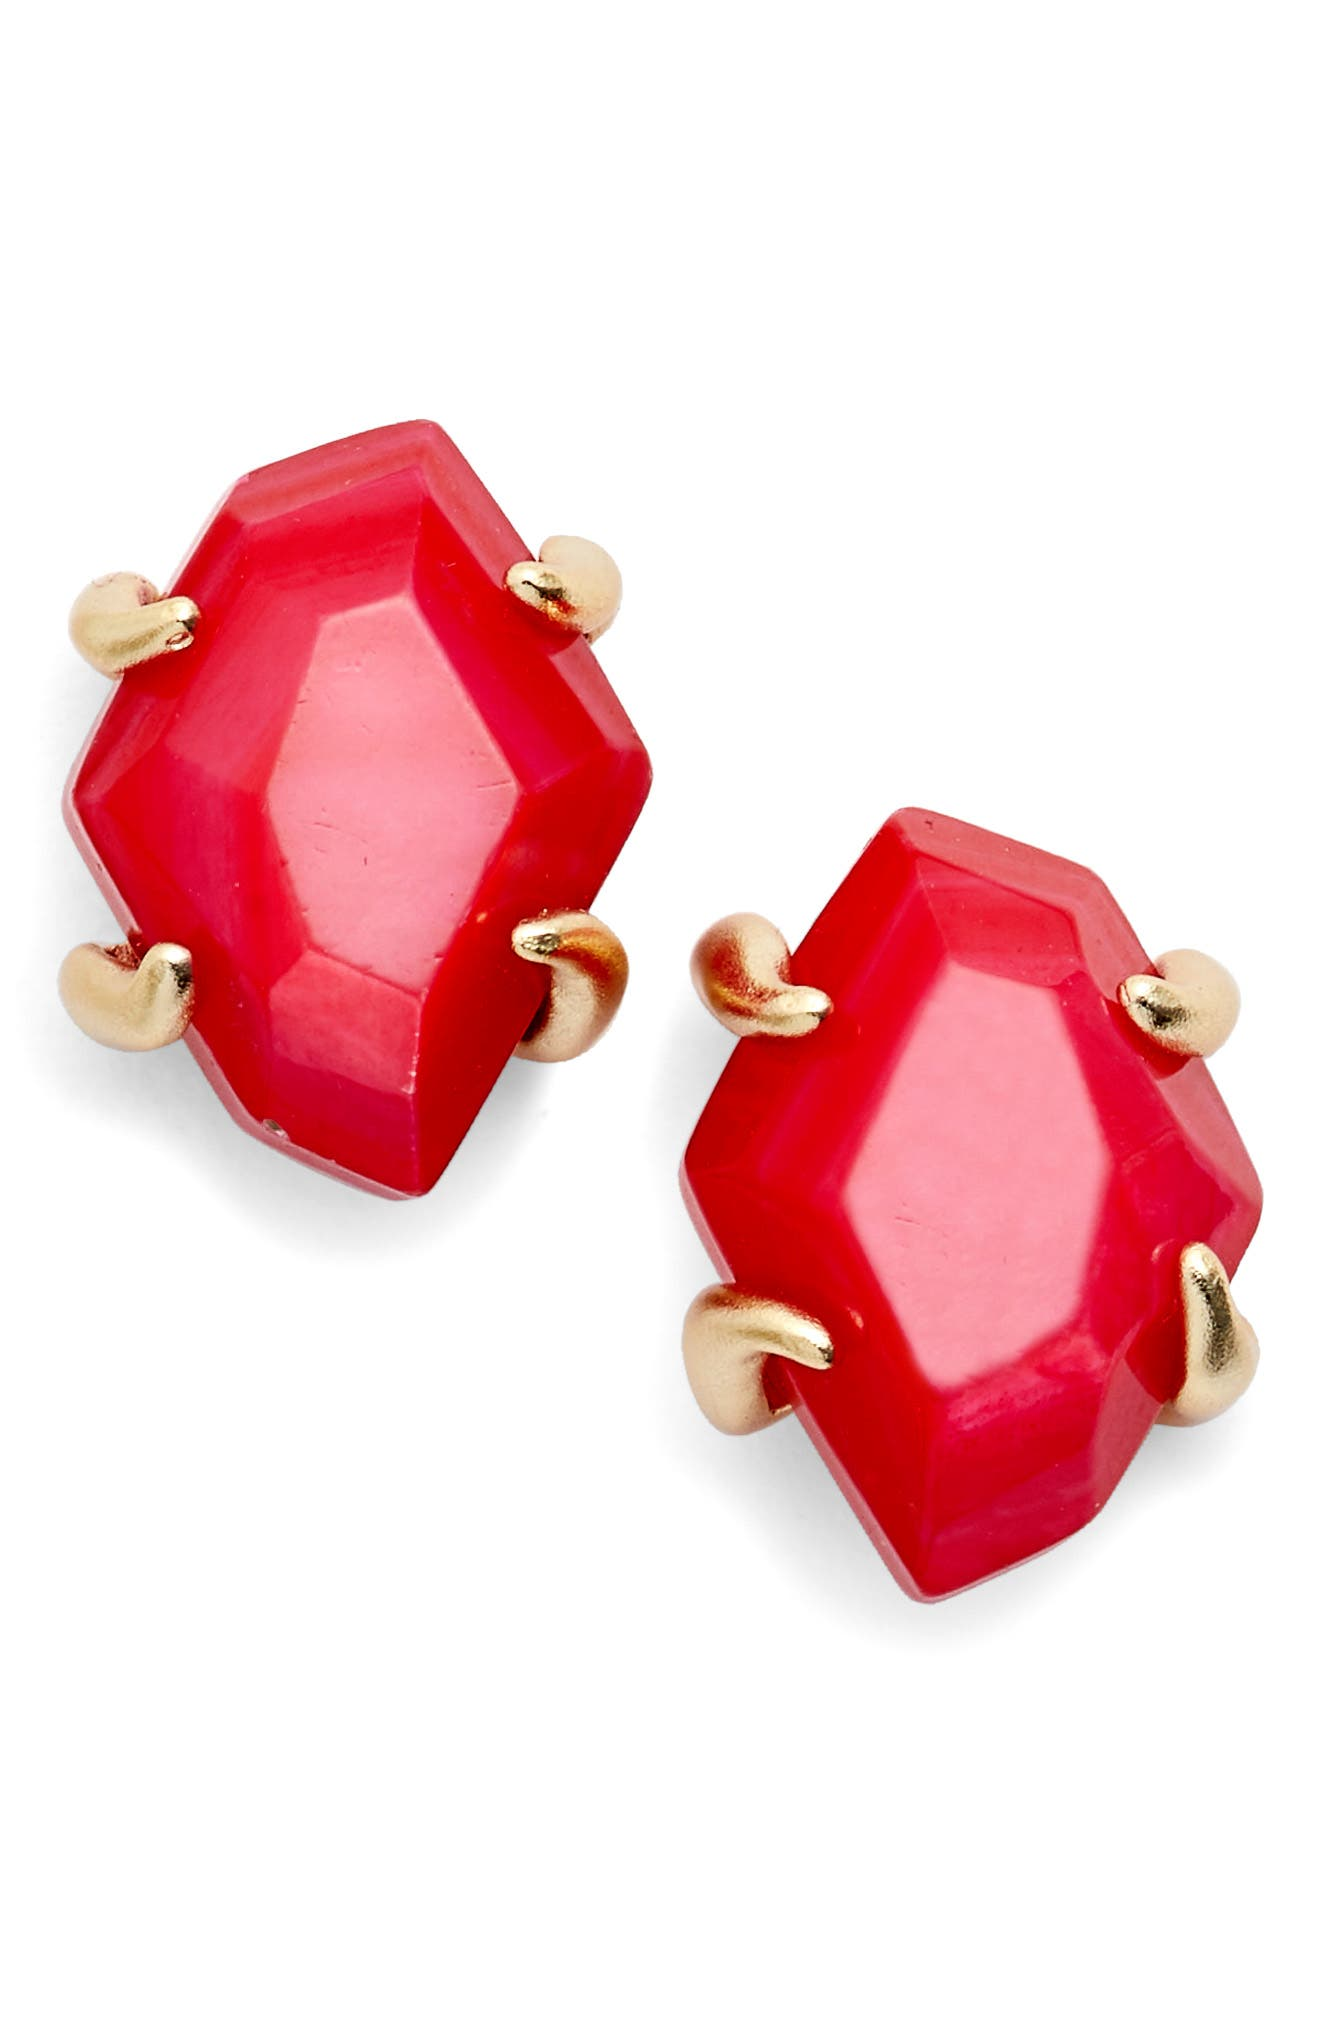 Inaiyah Stud Earrings,                             Main thumbnail 1, color,                             Red Mop/ Gold